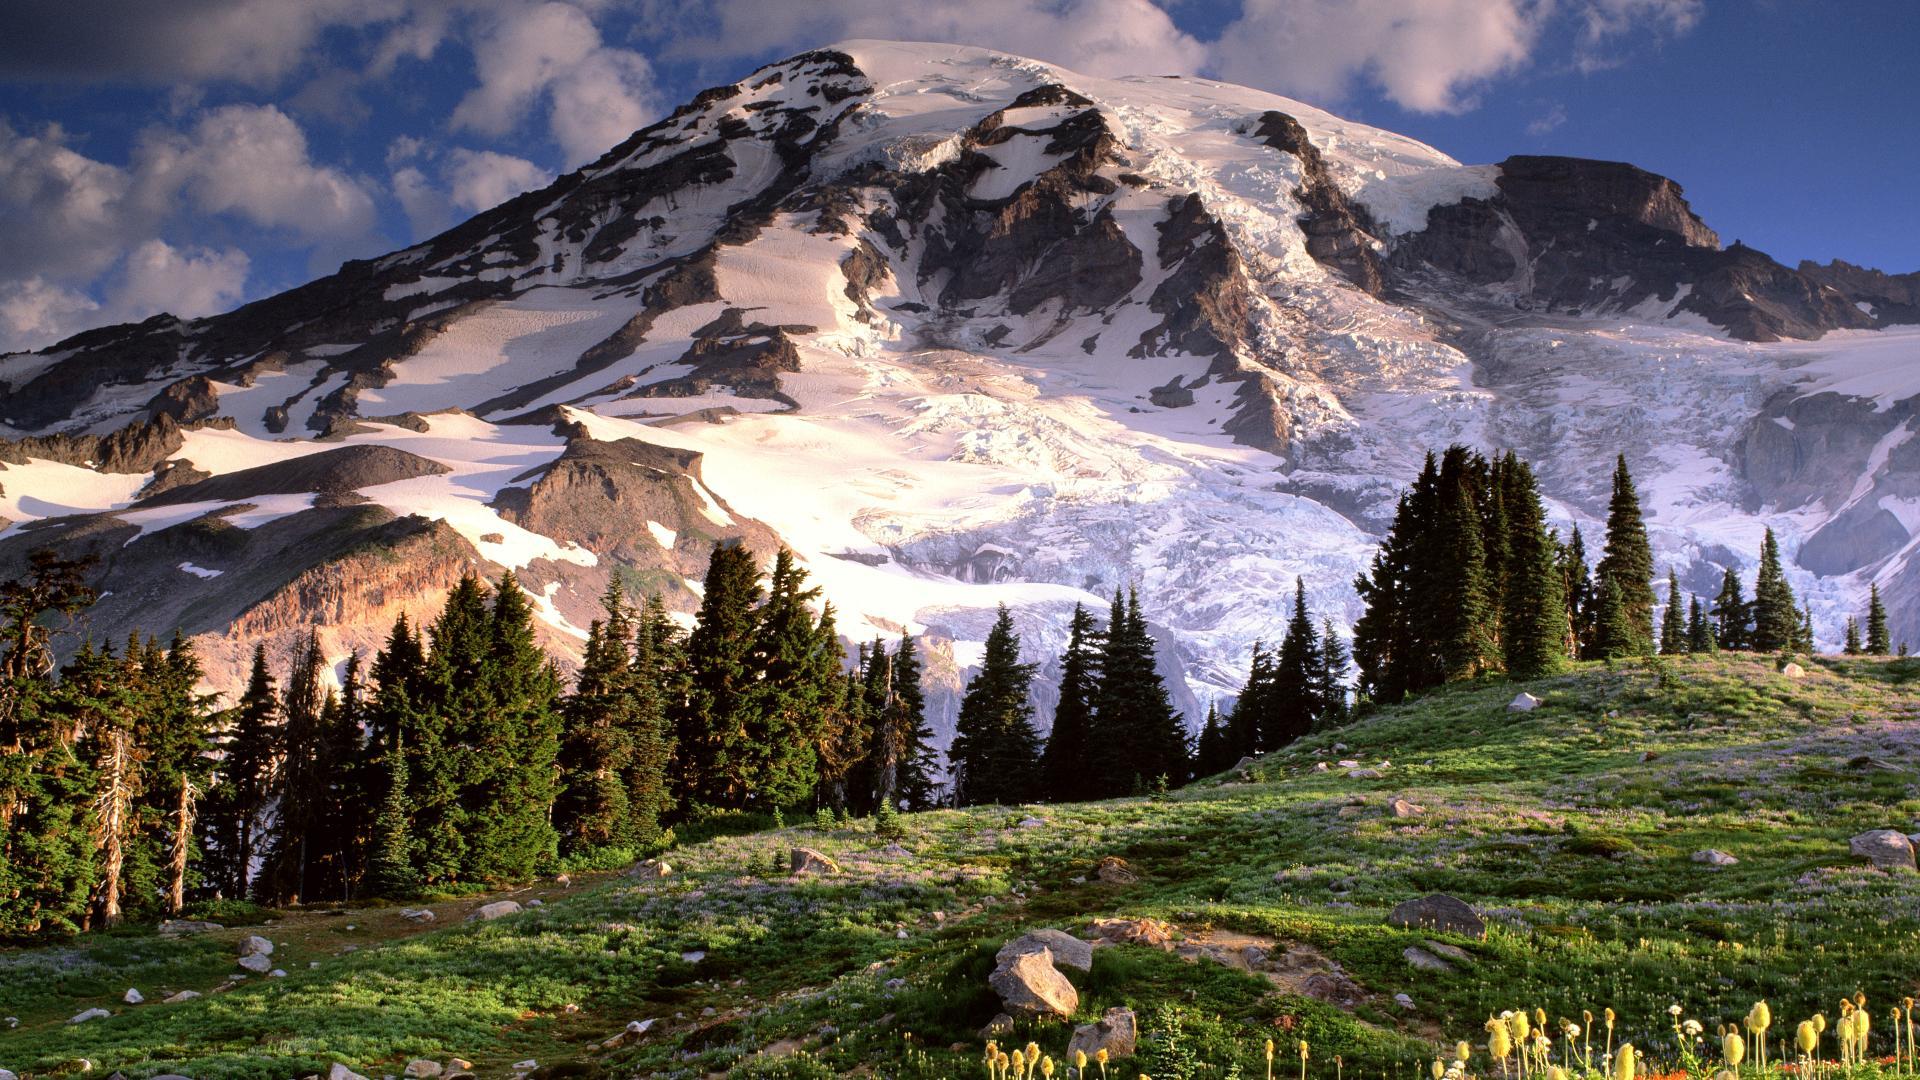 landscape hd mount image